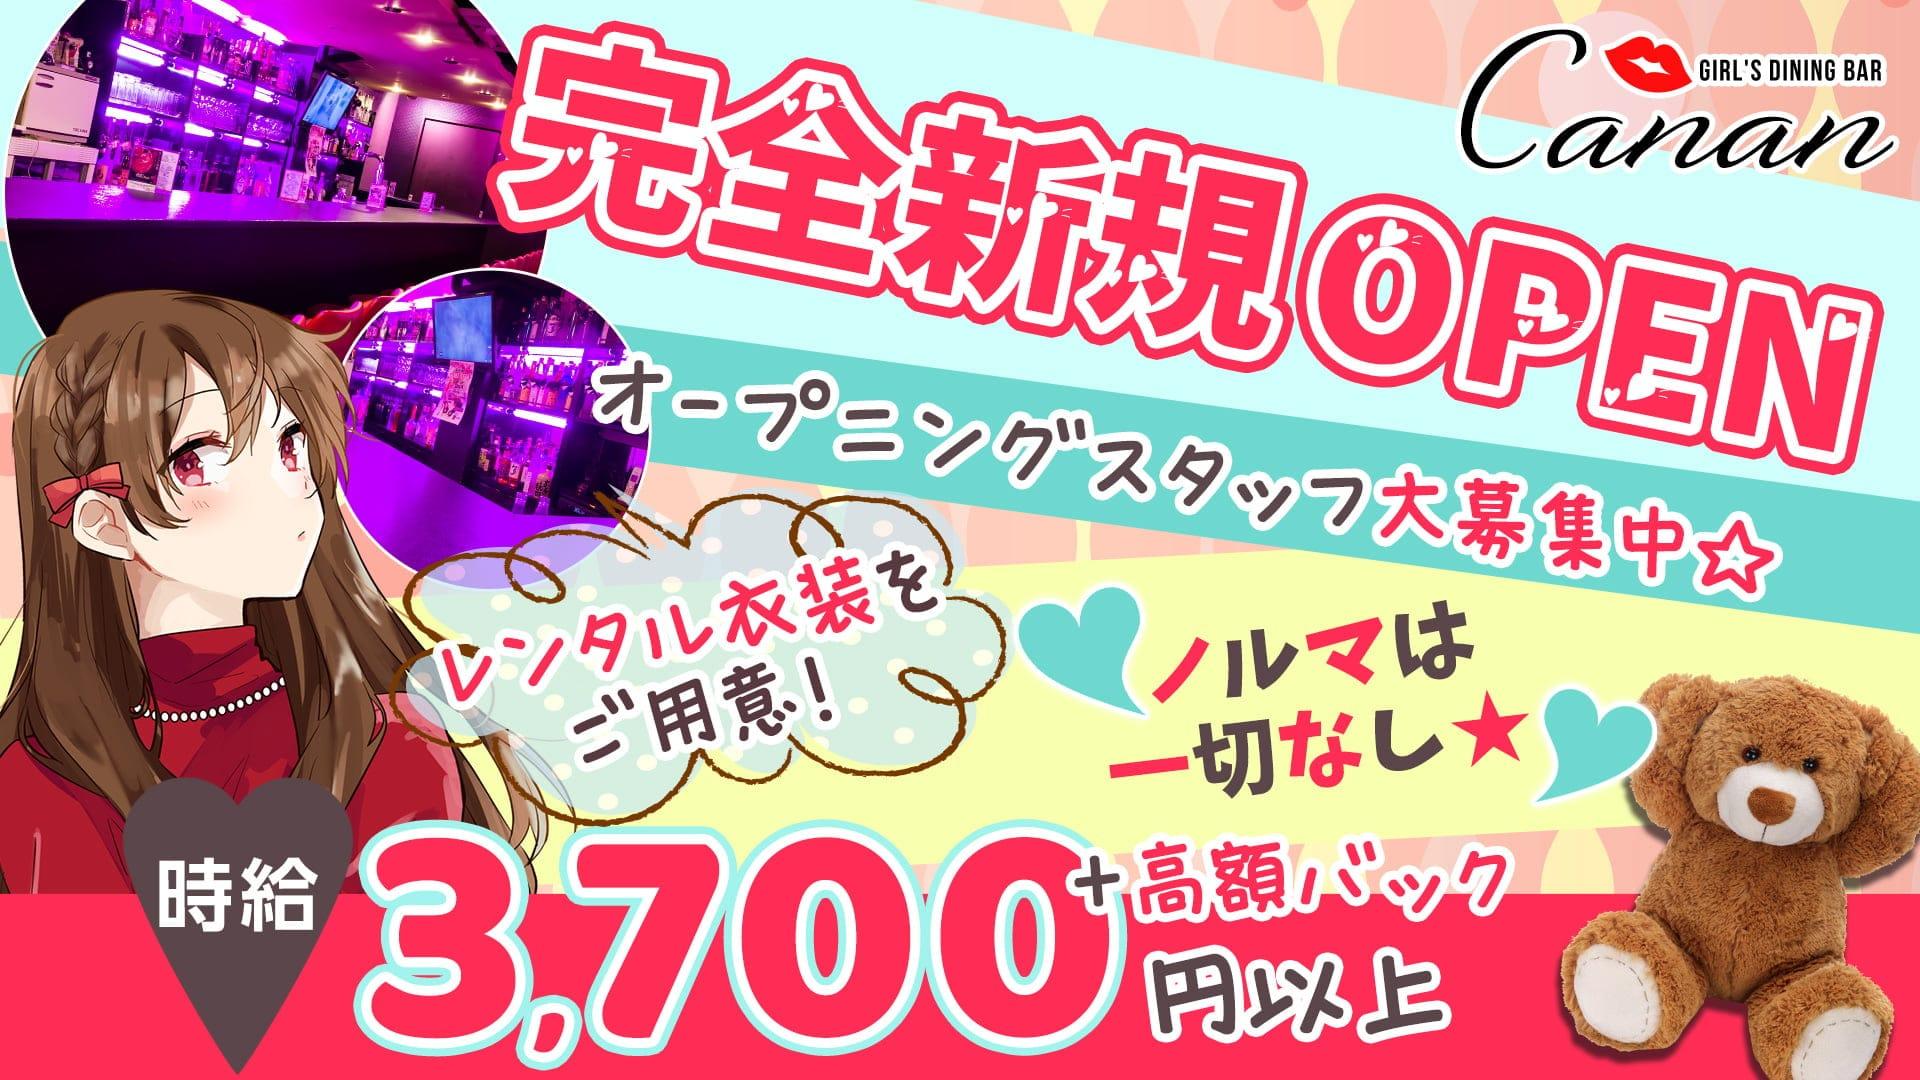 GIRL'S DINING BAR Canan (カナン)【公式求人・体入情報】 神田ガールズバー TOP画像